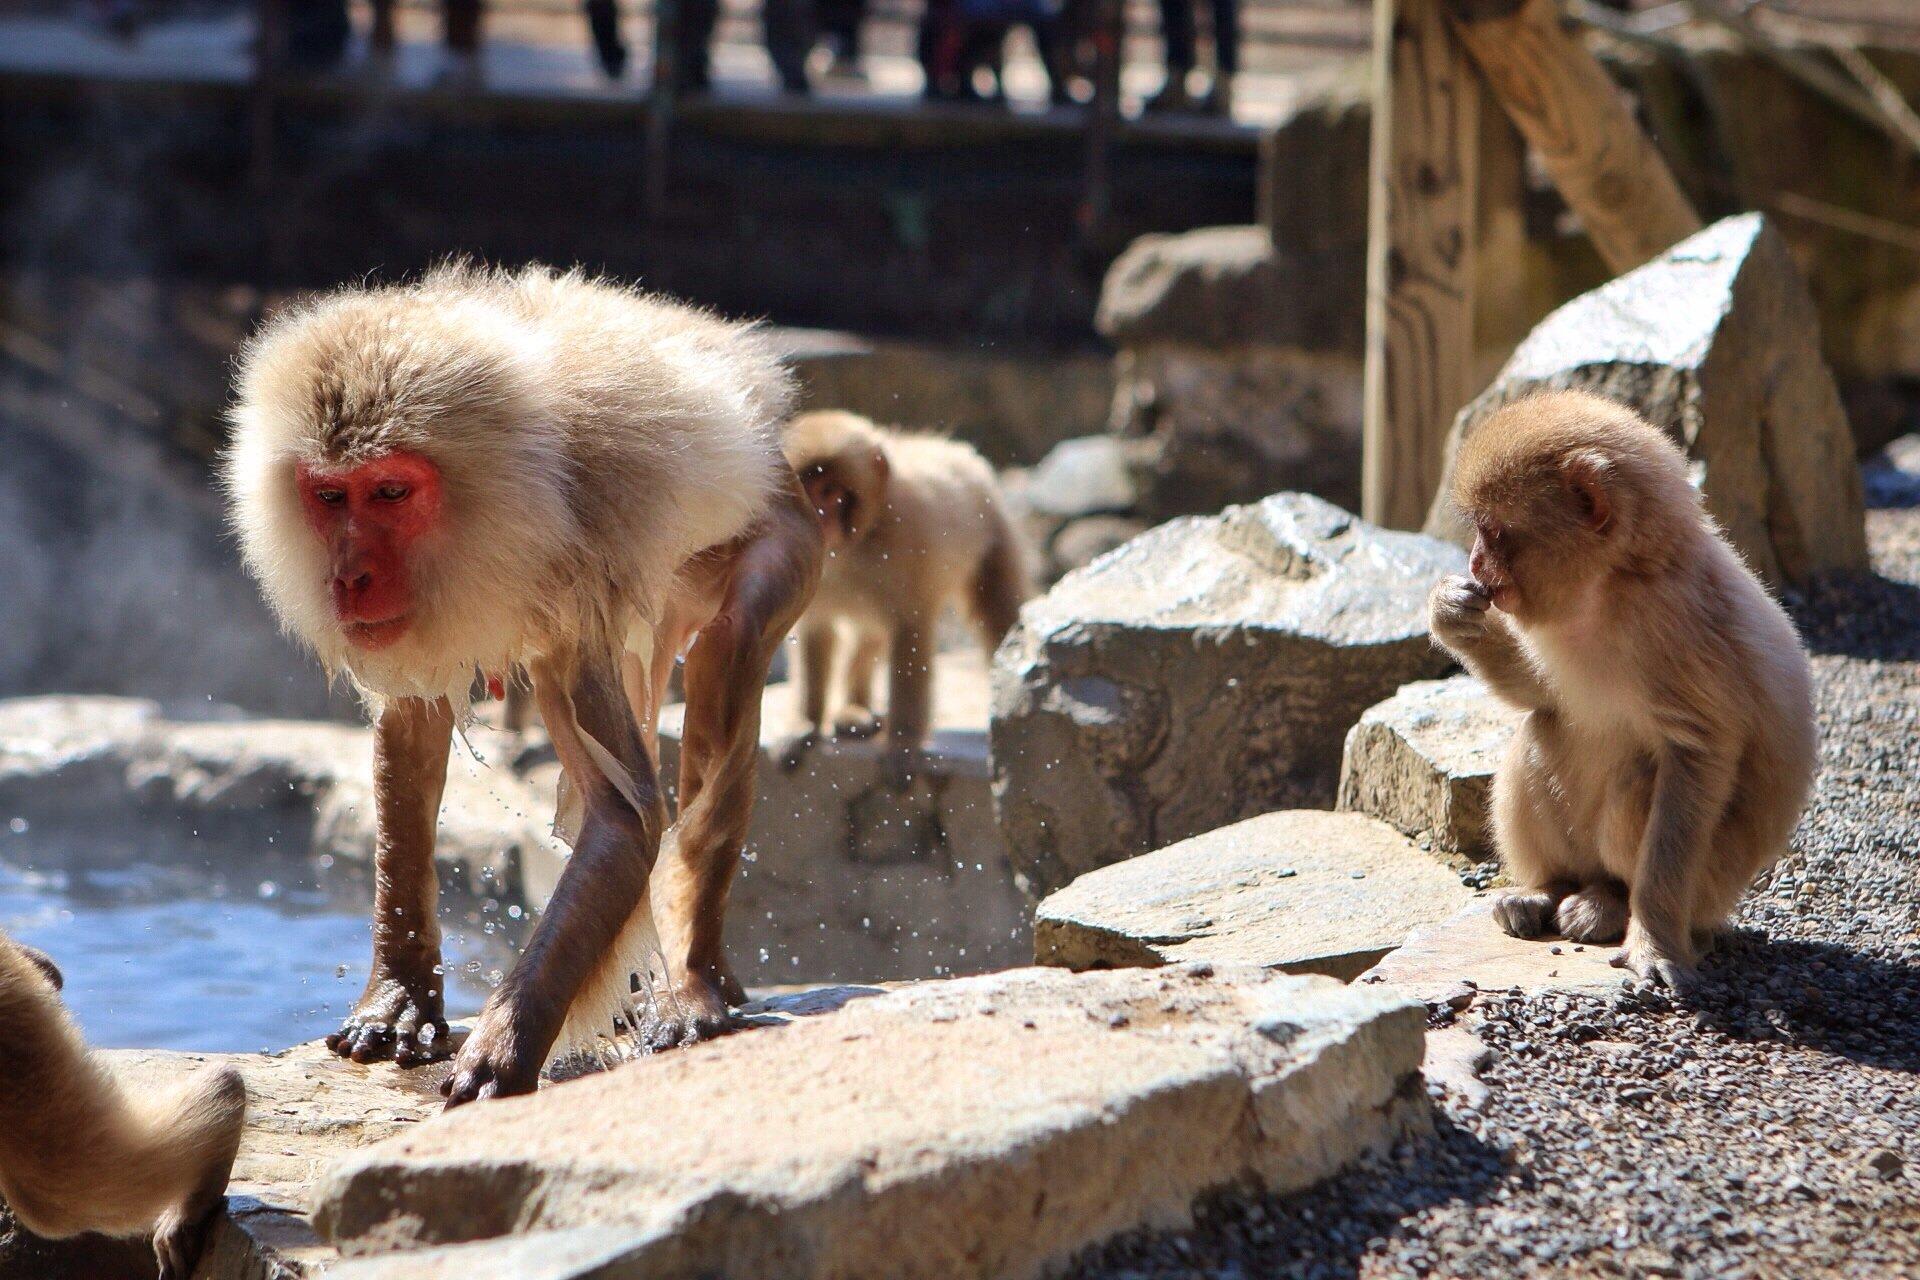 snow-monkeys-1-kasuma-photo-blog